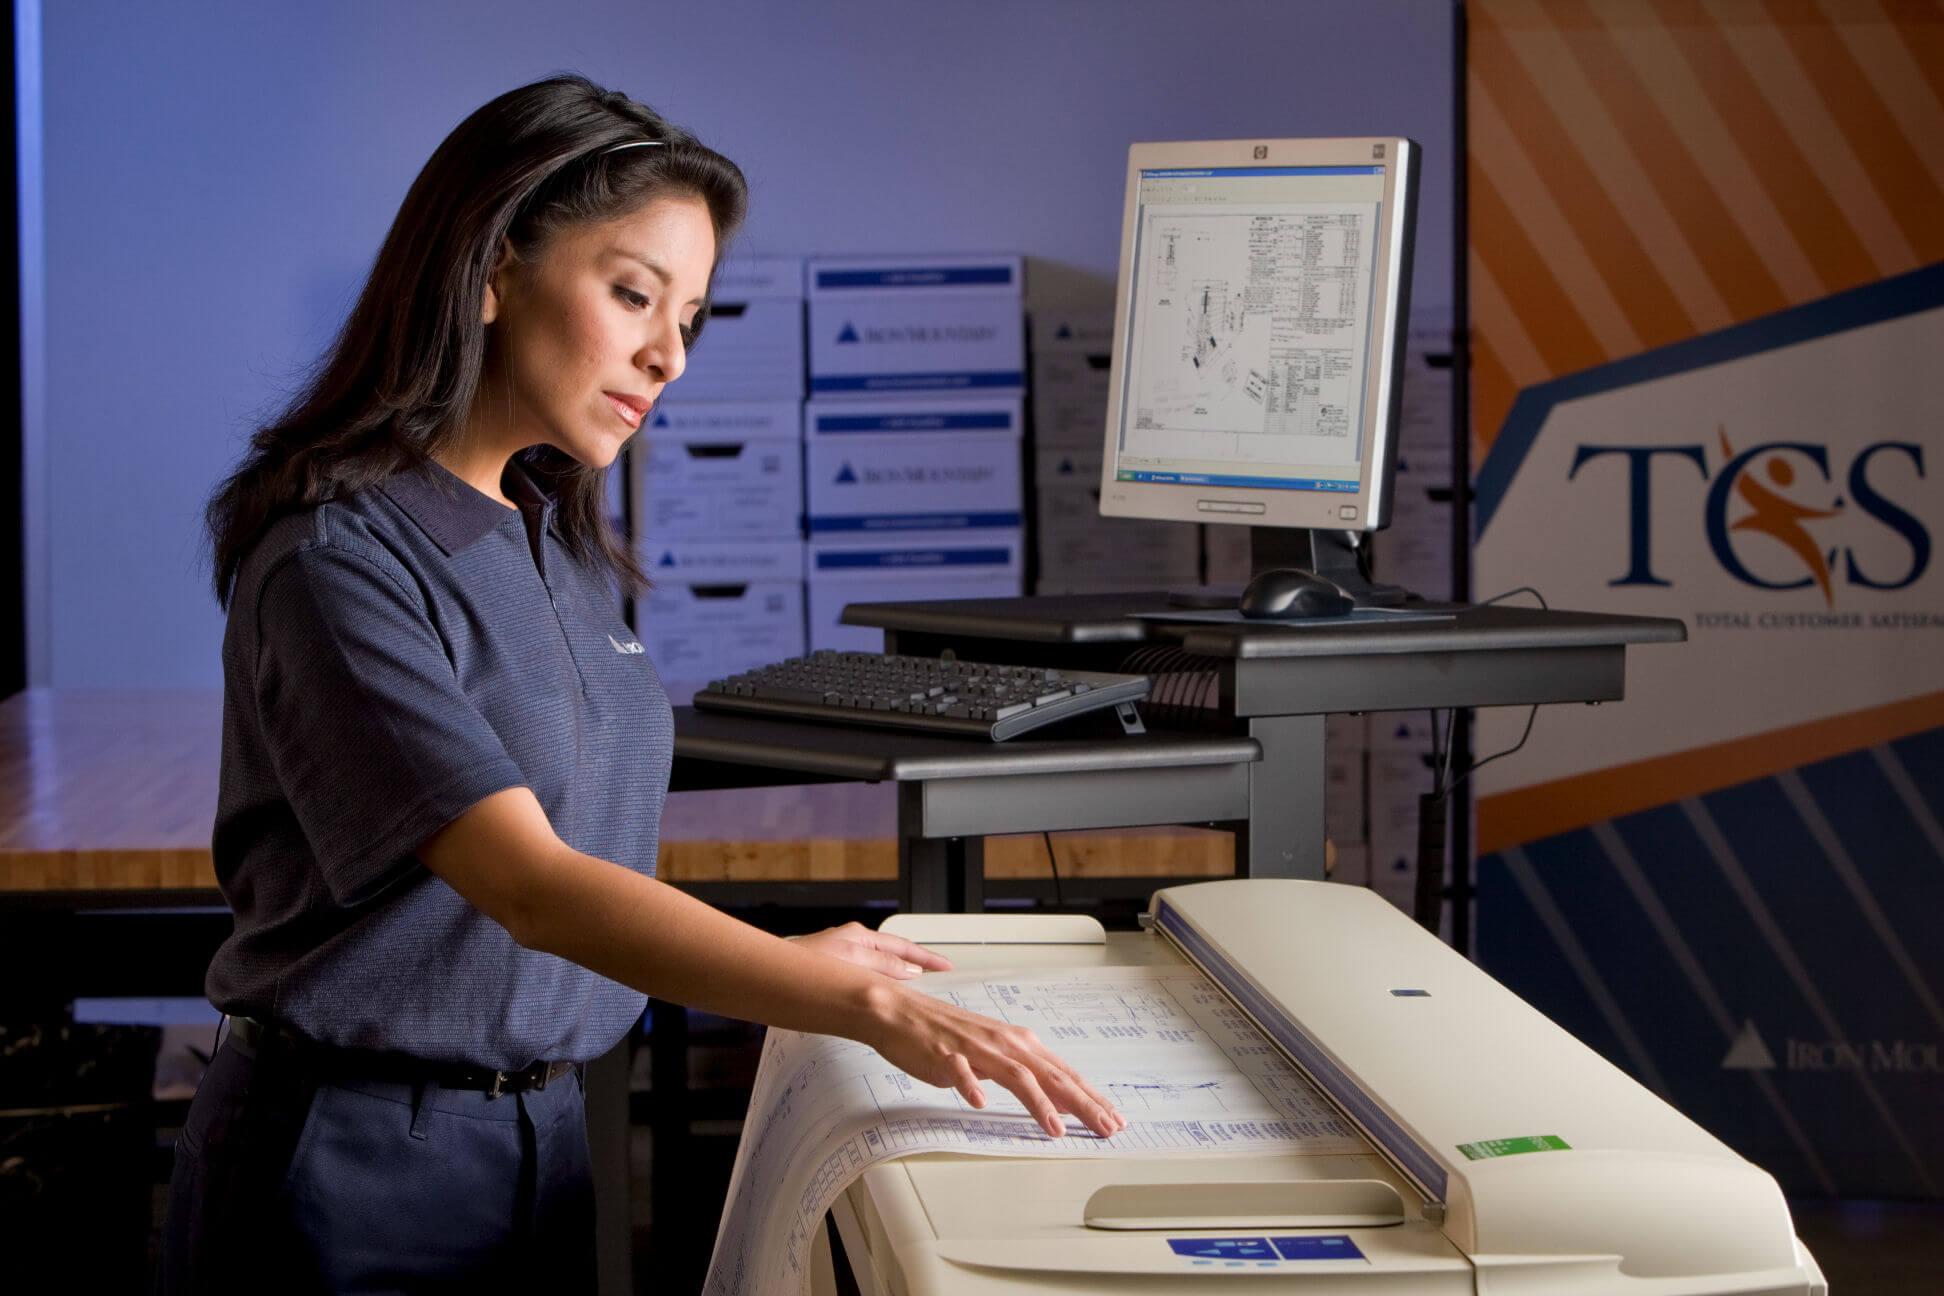 iron-mountain-employee-scanning-document